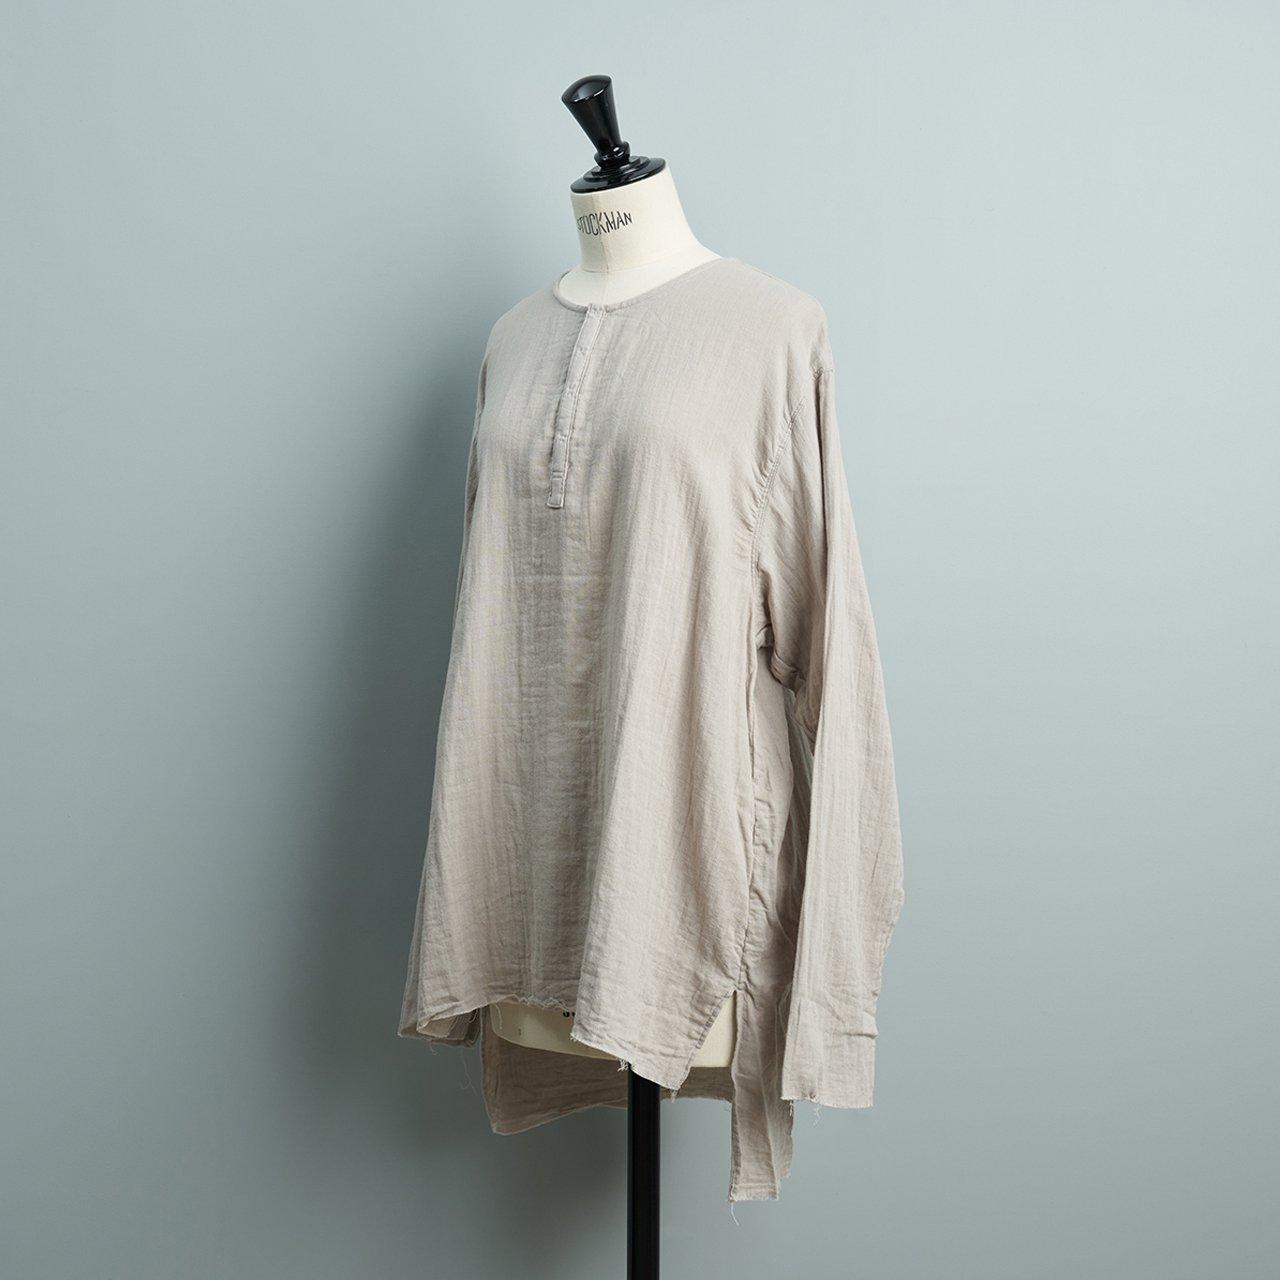 suzuki takayuki <BR>gauze shirt<BR>grey